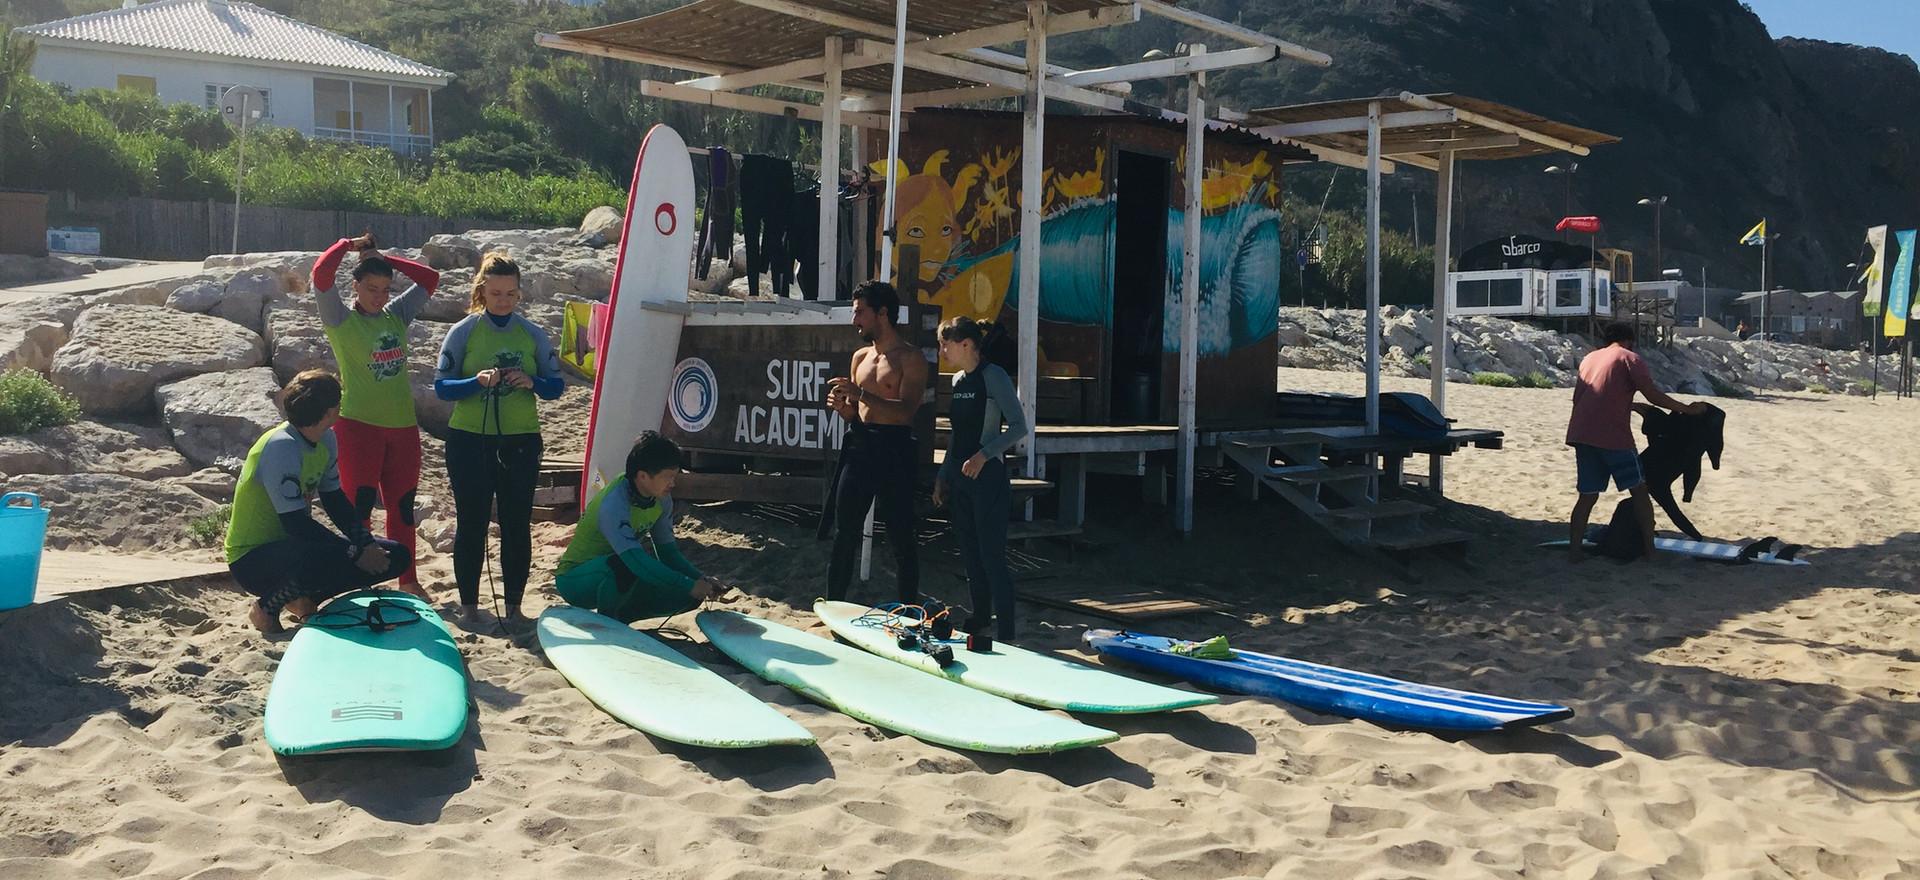 Surf school Praia Grande Oasis Sintra Surf